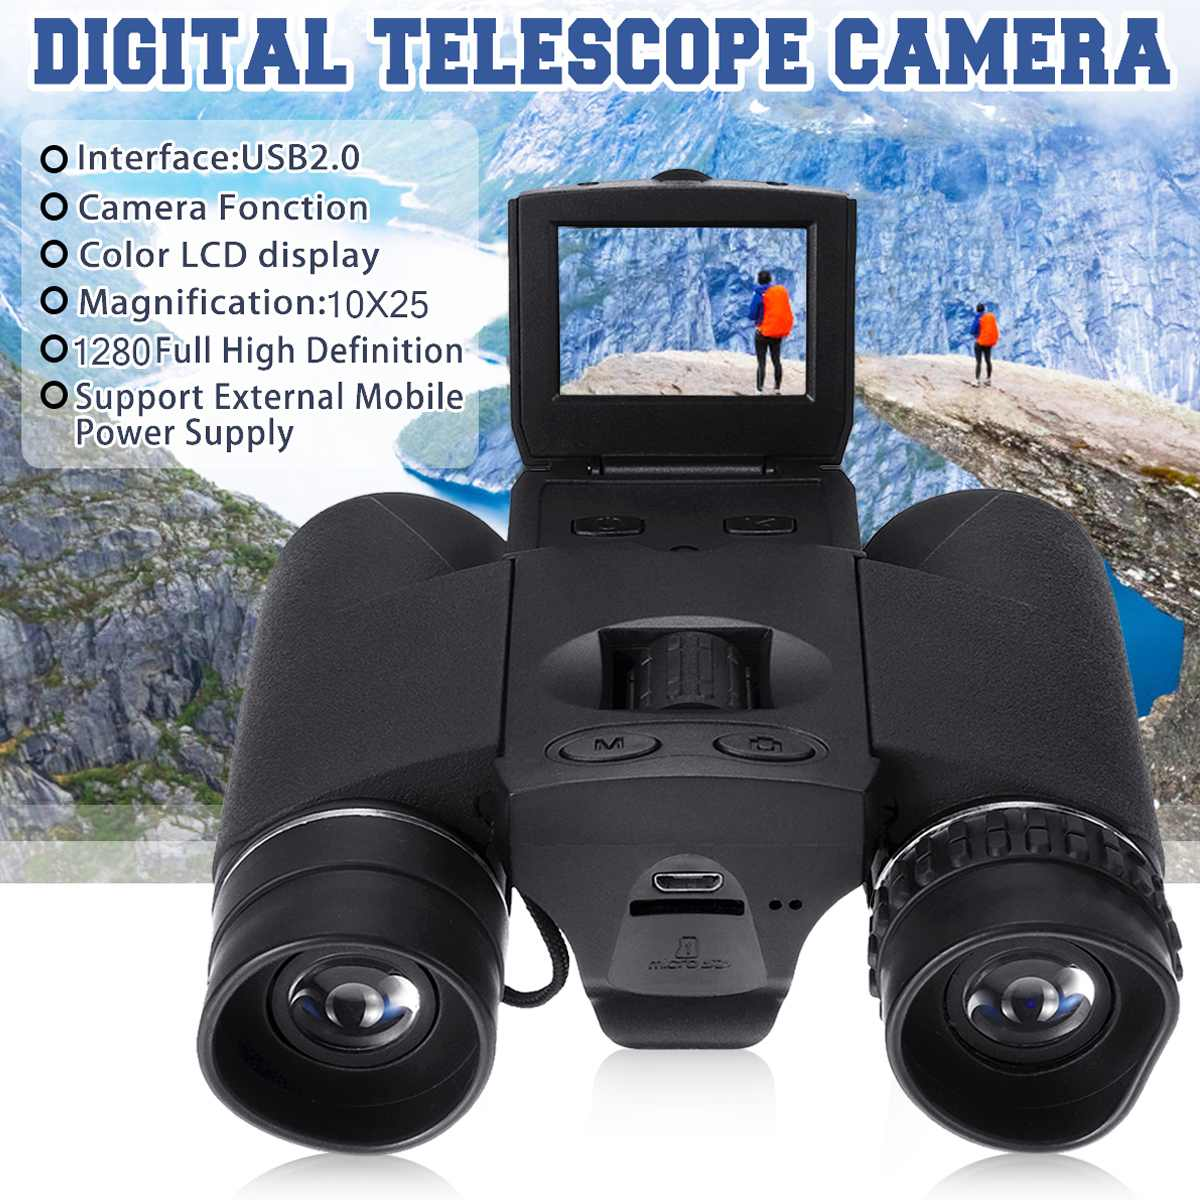 New Full HD 2inch LCD BD318 Zoom Digital Binoculars Telescope Video Camera Outdoor Telescope Hunting Camera Telescope 12X32 Hot